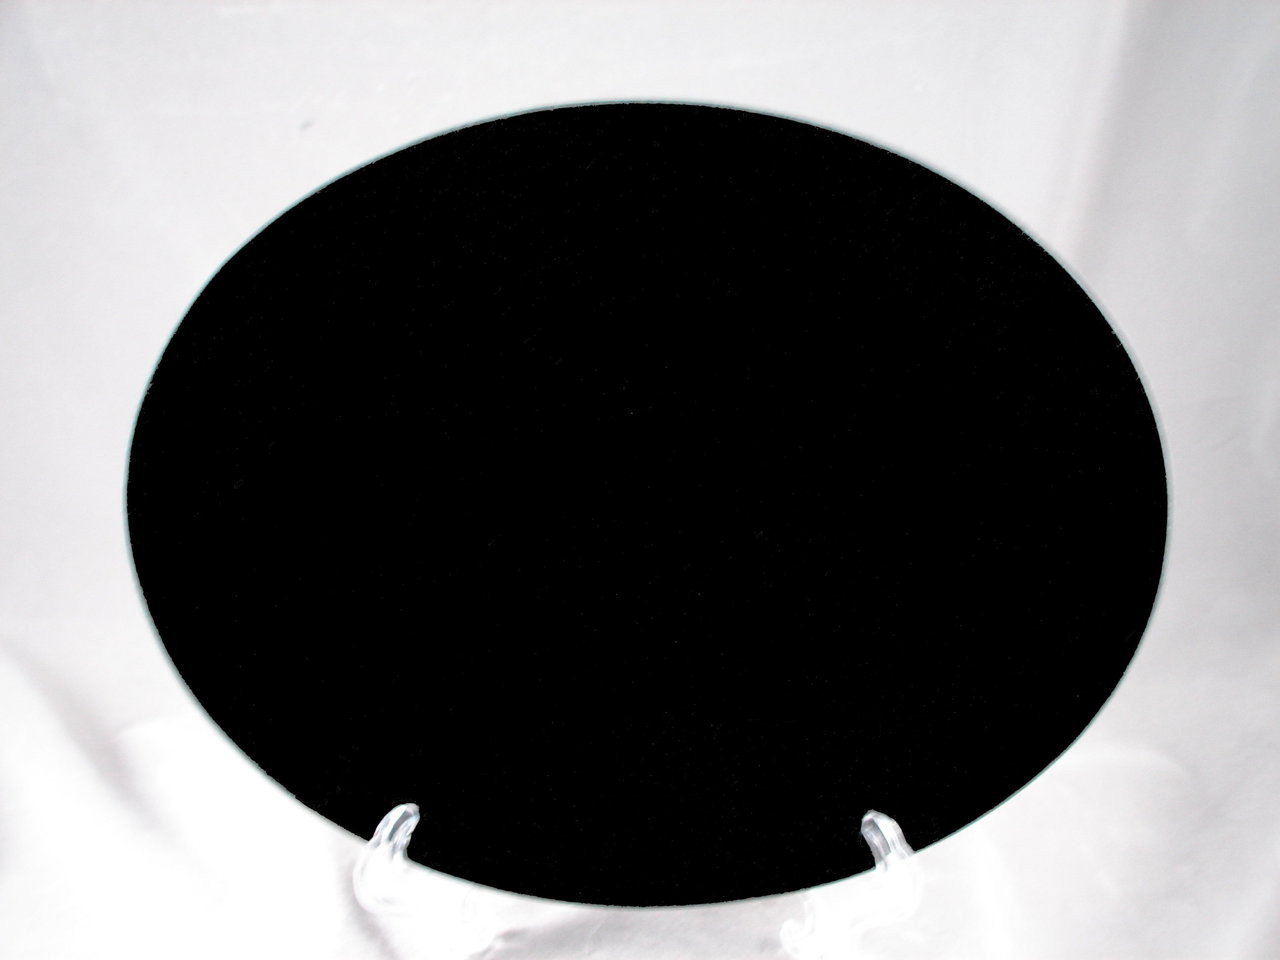 "G-MB-8.5 x 11 Oval EP, LaserGrade, MB Black Granite, 8.5"" x 11"" x 7-8mm"" , Oval, Edges Polished, (5 face polished)"